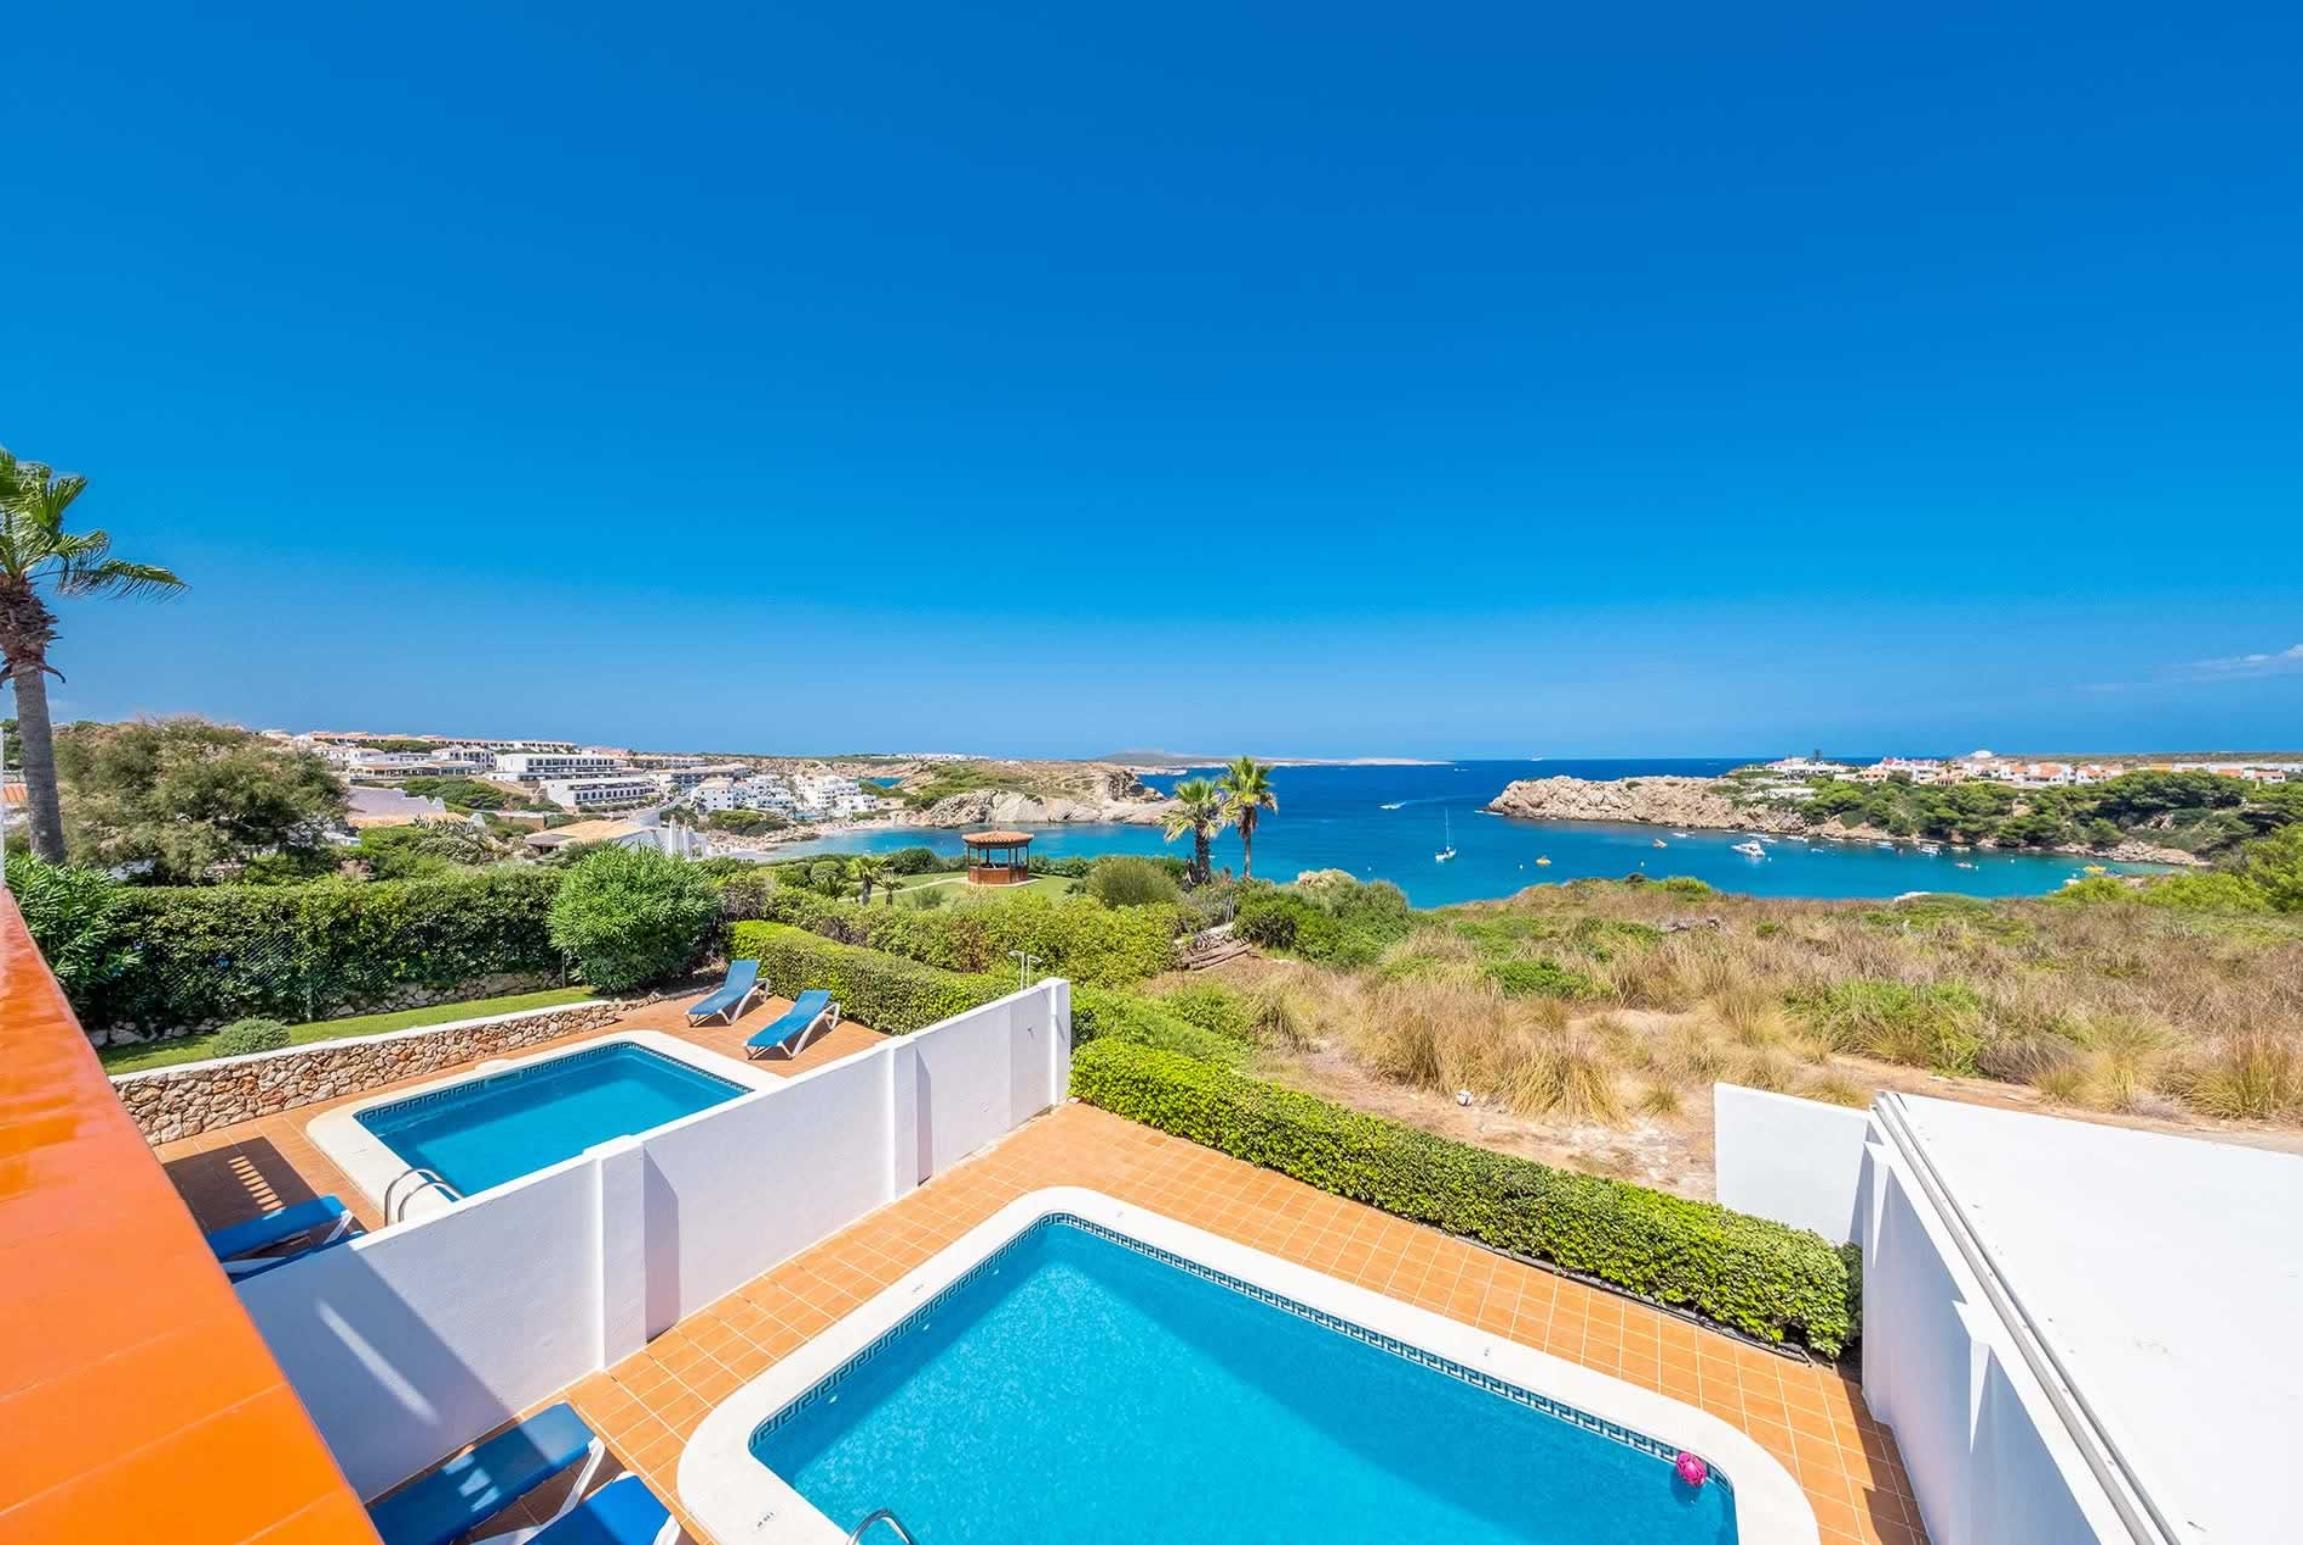 Ferienhaus Bellavista II (2654270), Arenal De'N Castell, Menorca, Balearische Inseln, Spanien, Bild 19